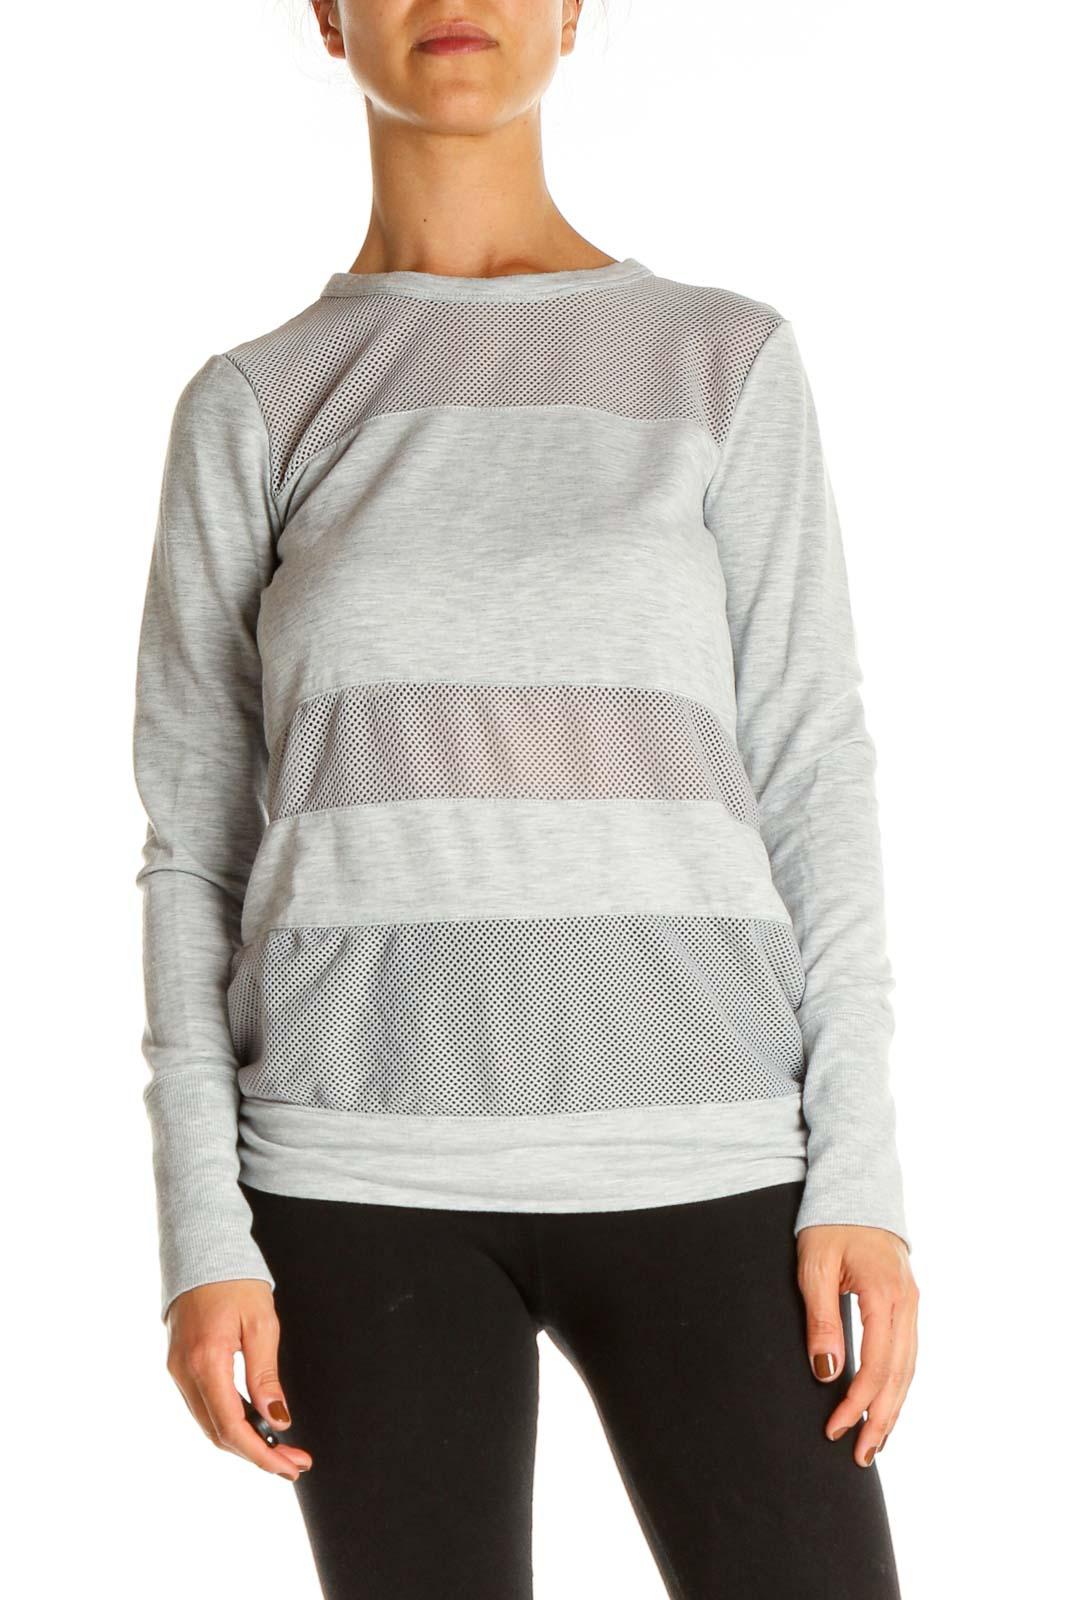 Gray Activewear Shirt Front